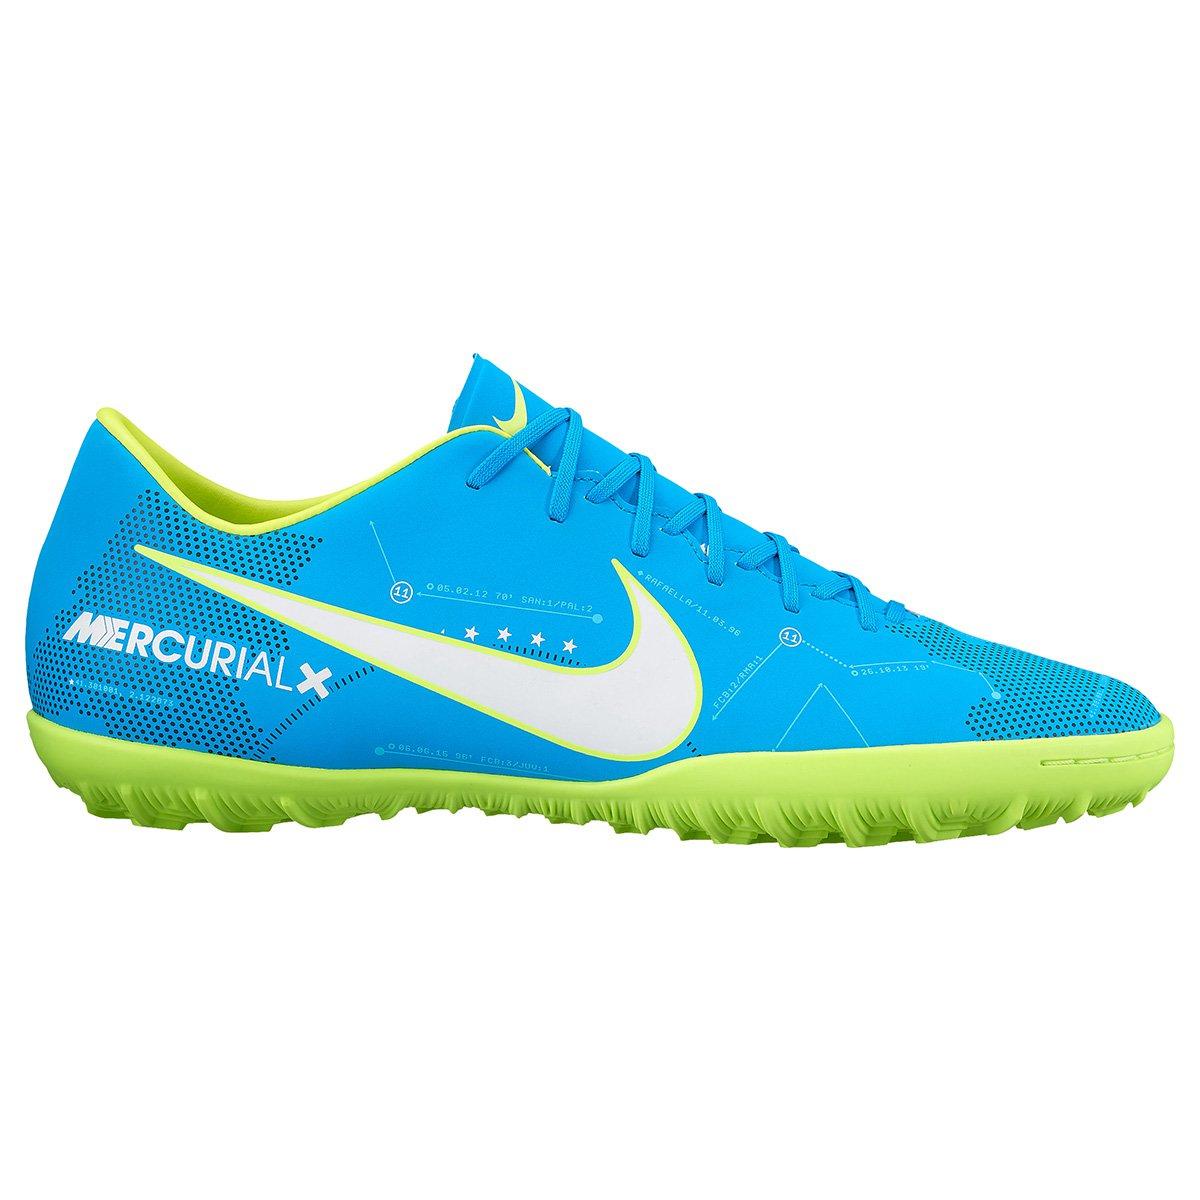 Chuteira Society Nike Mercurial Victory 6 Neymar Jr TF - Compre ... b71de950d6cbe